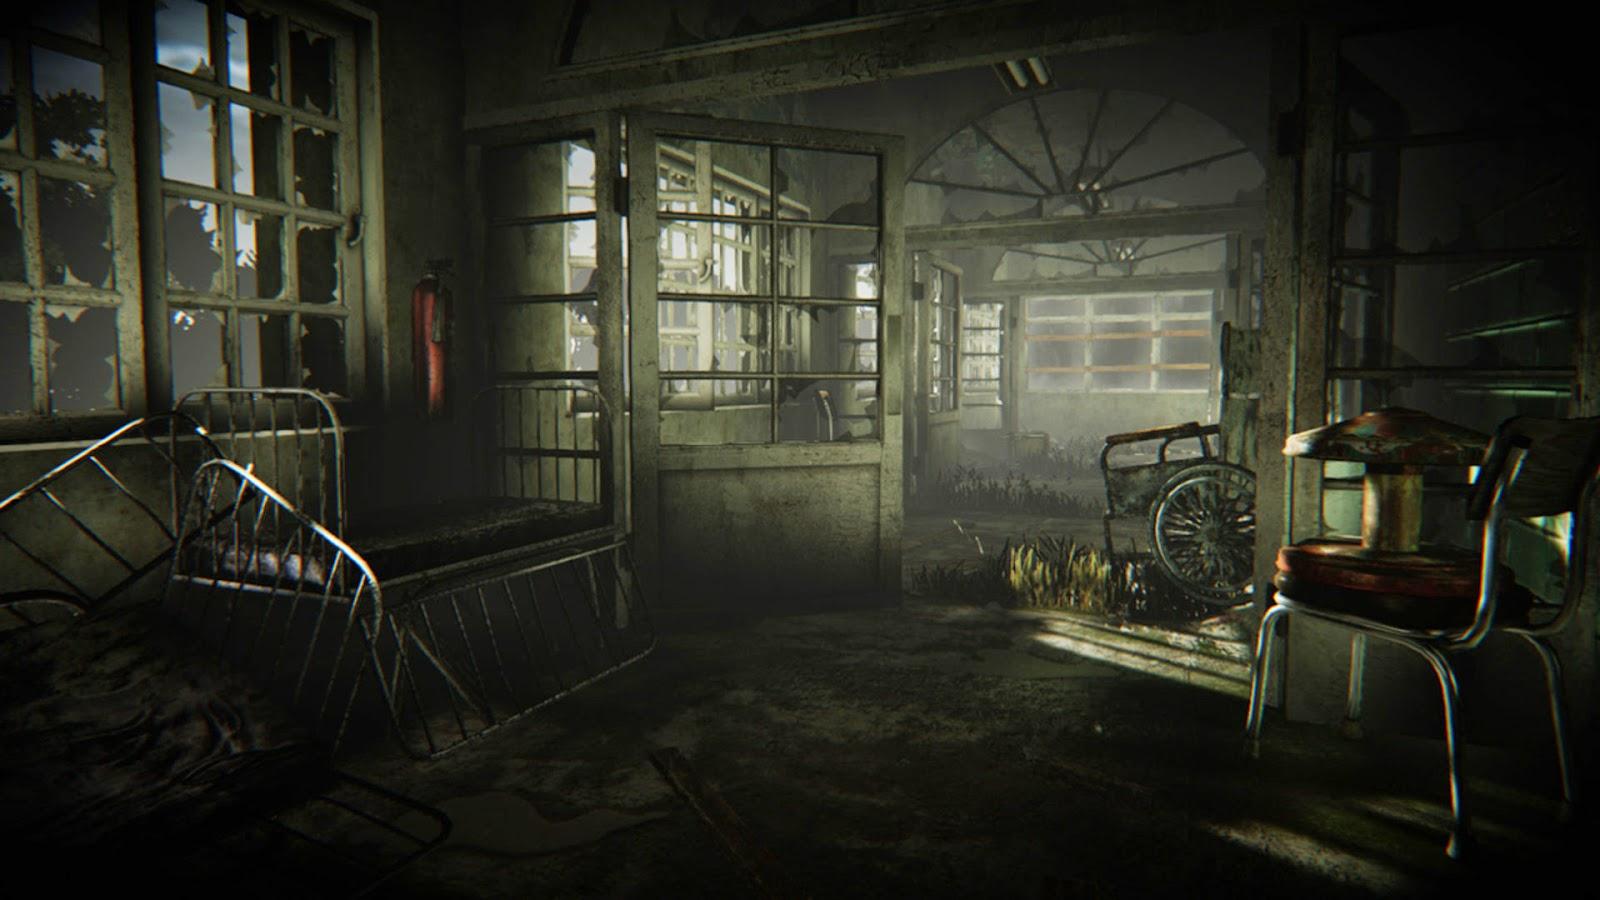 Scary mental hospital abandoned mental hospital